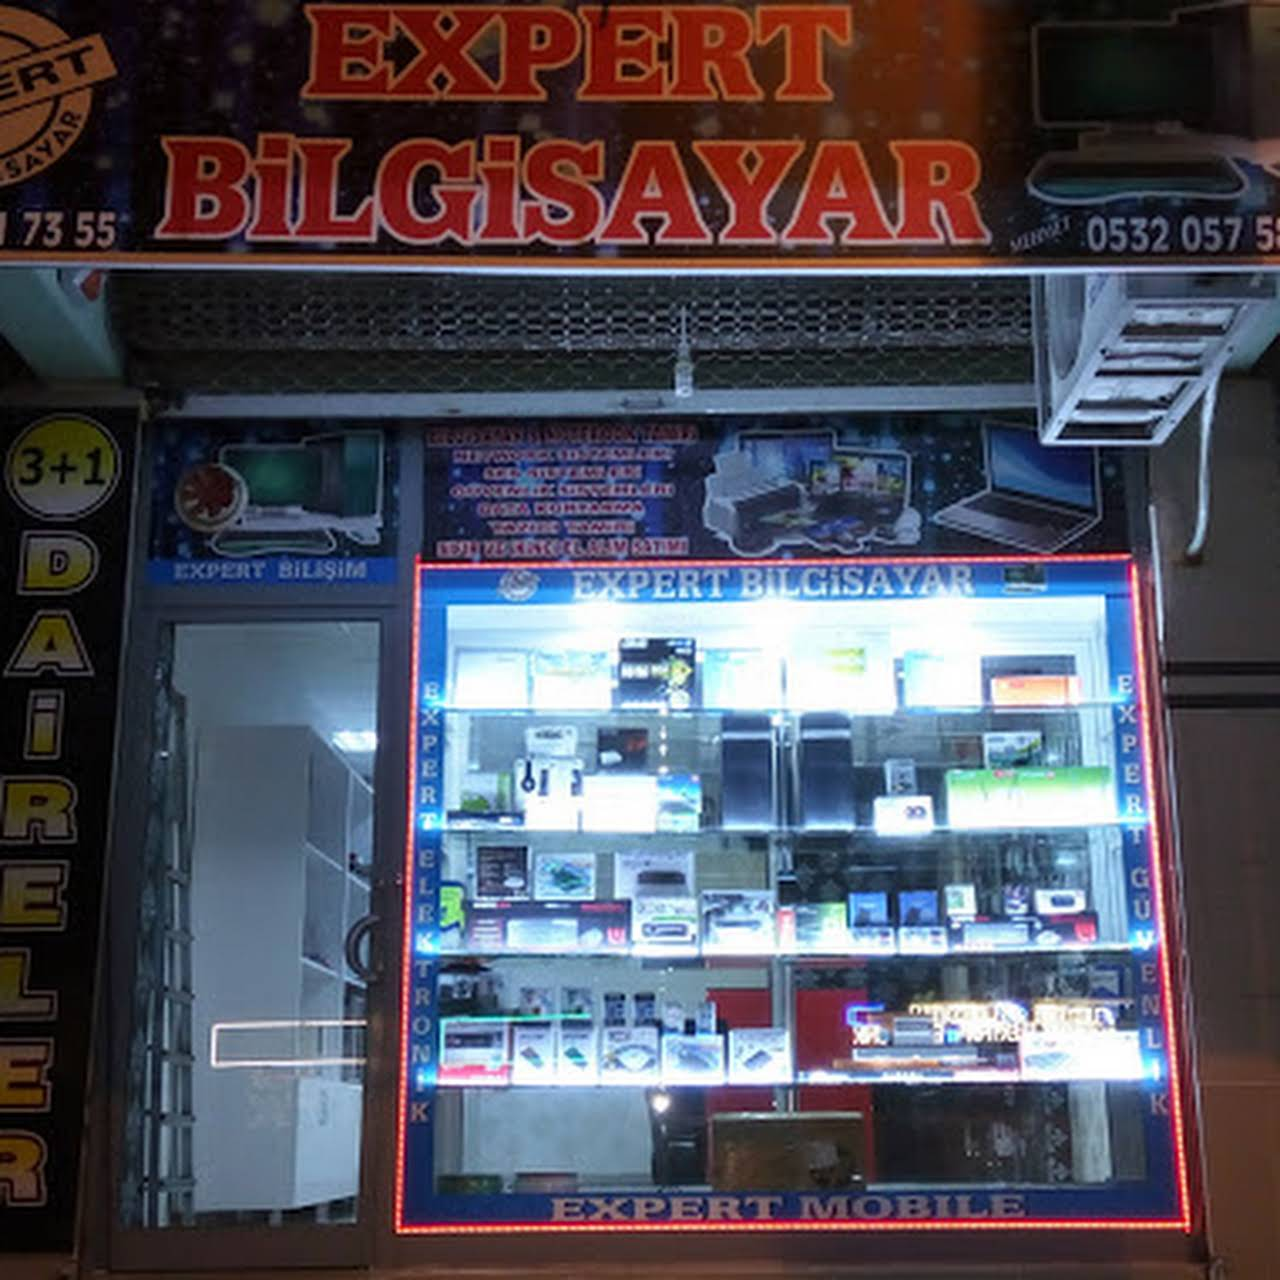 expertbilgisayar business site